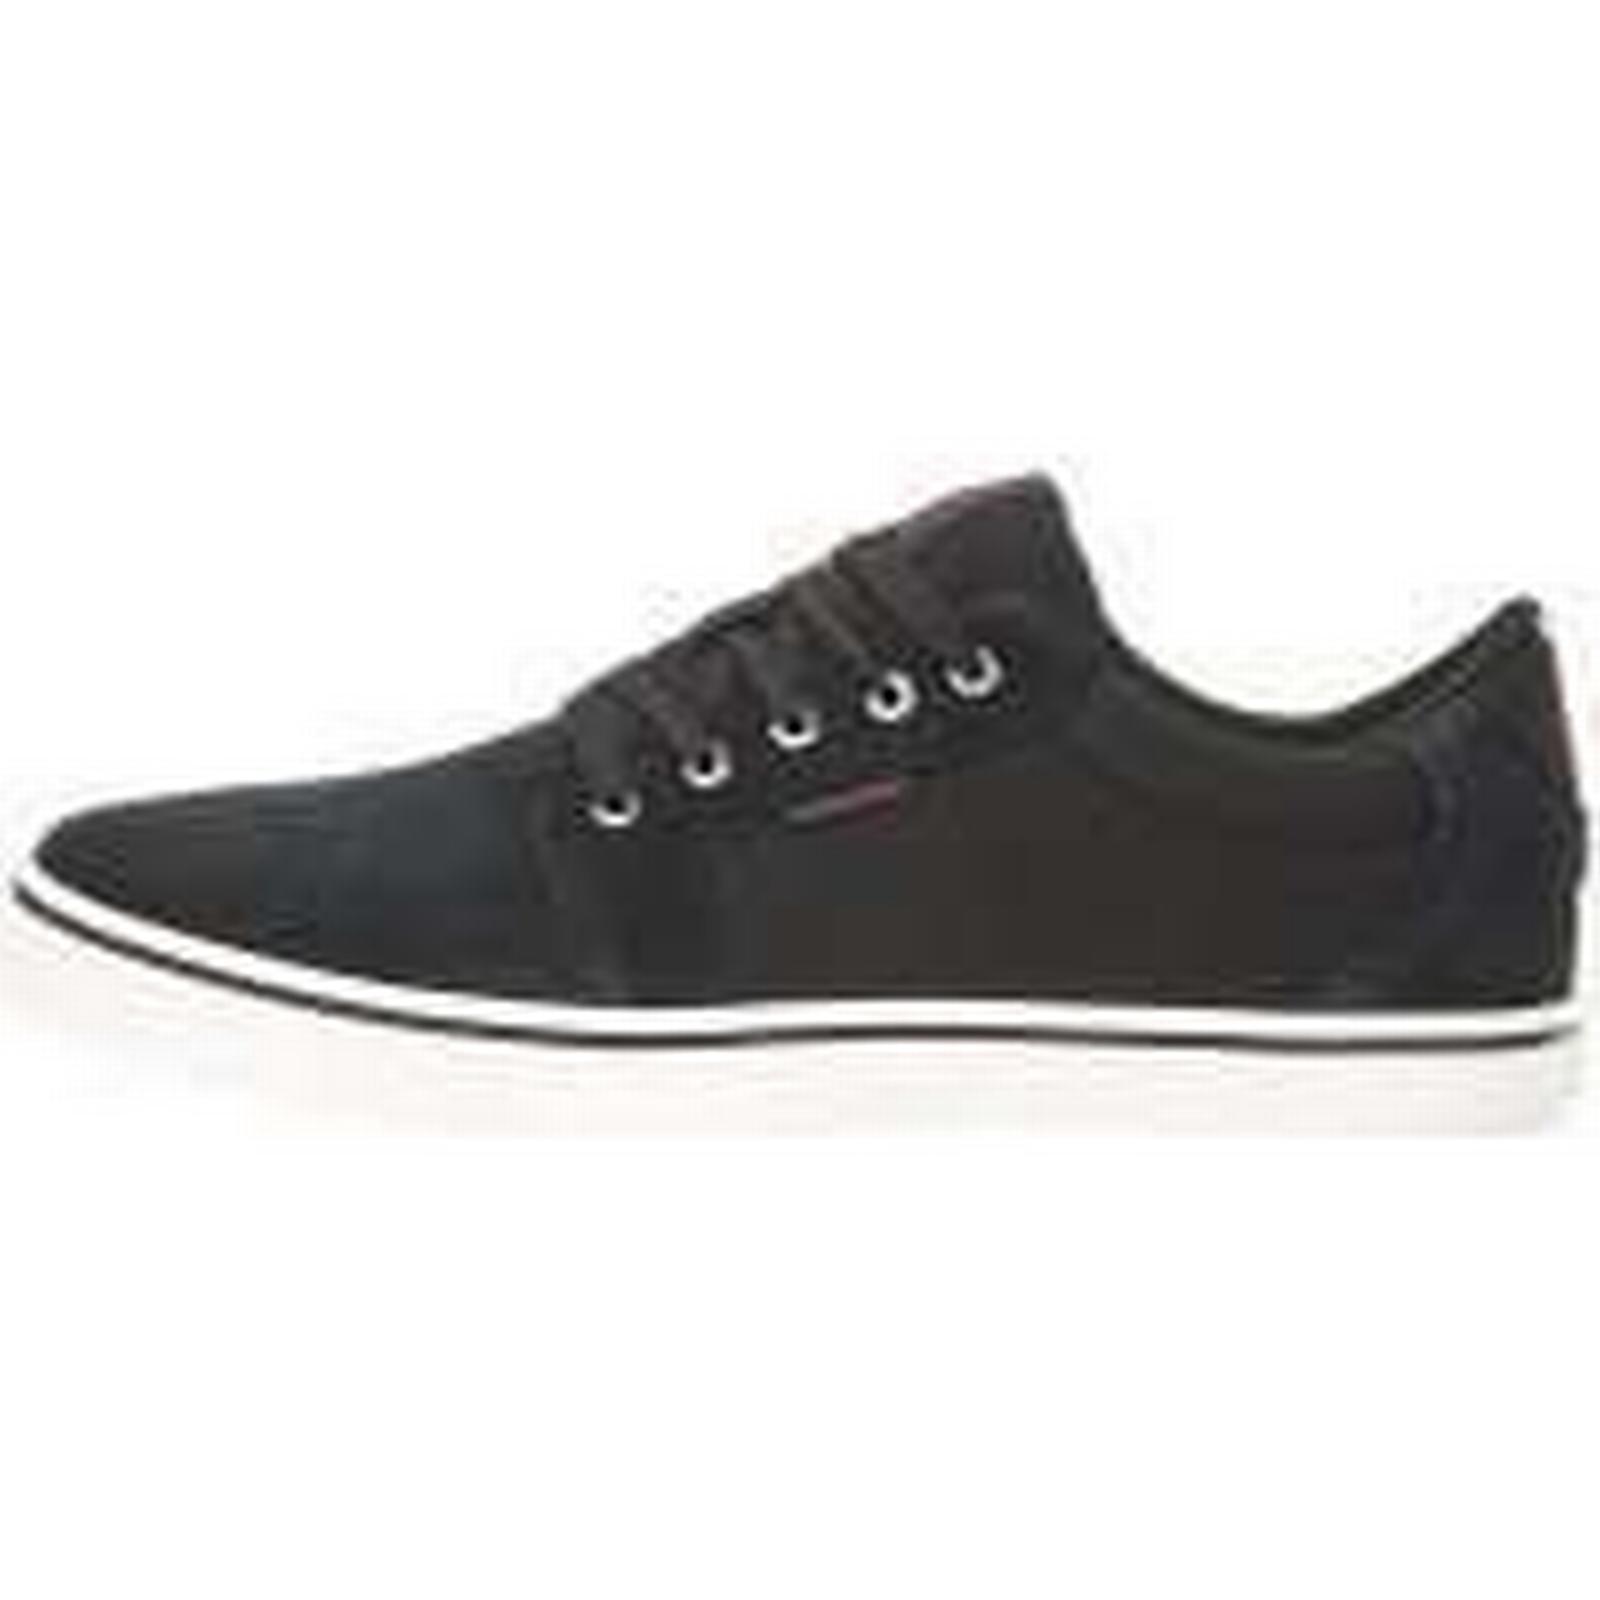 JACK Men & JONES Casual Sneakers Men JACK Black (40)/Man/Woman/ Unusual fad360